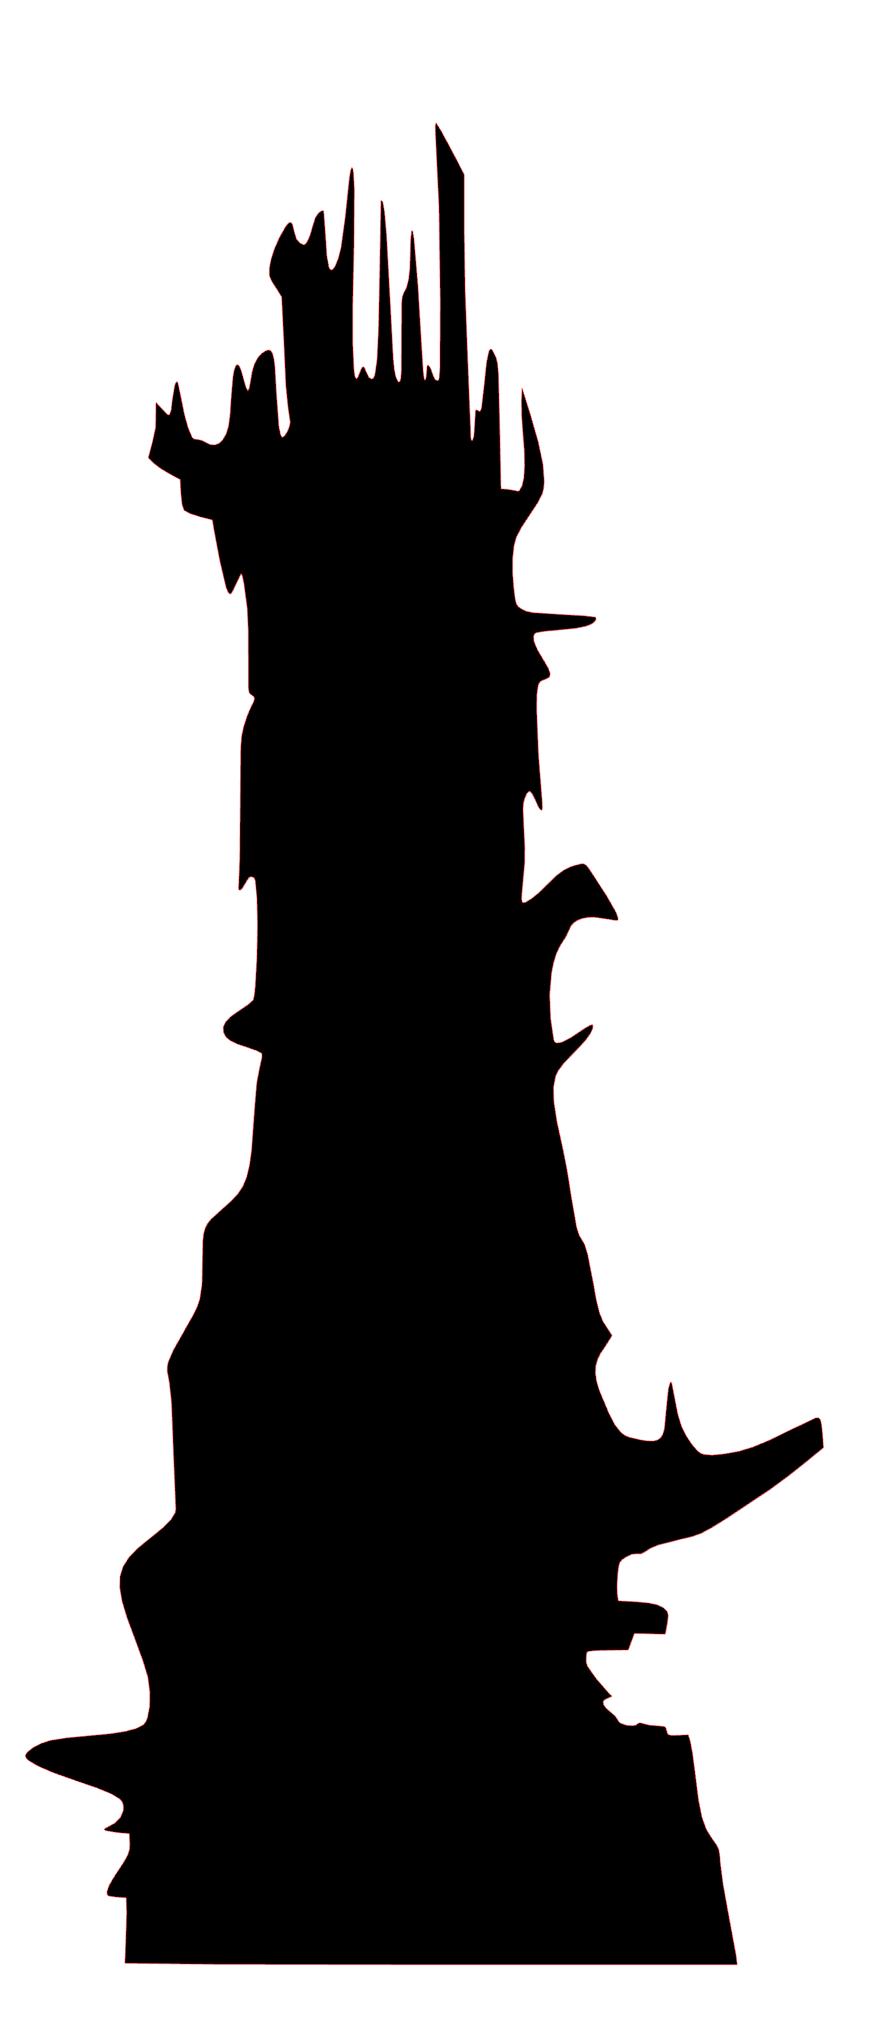 Dark Tower clipart #9, Download drawings